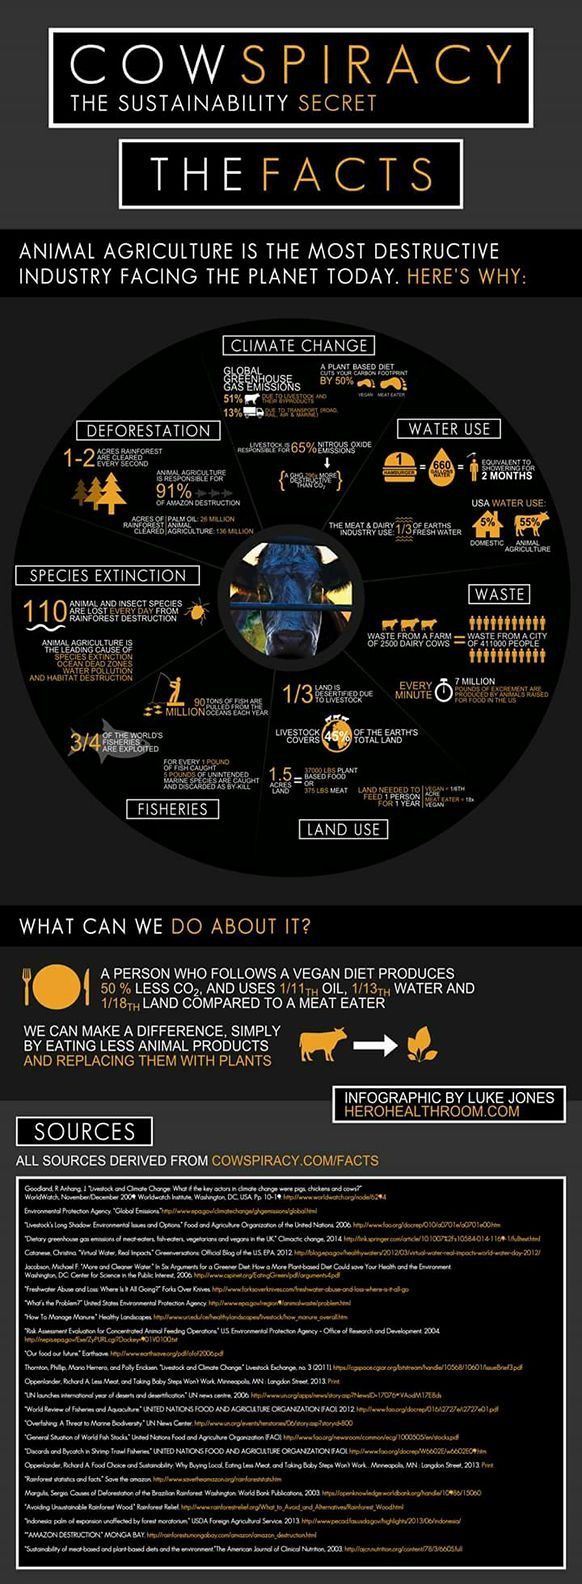 Cowspiracy the movie.